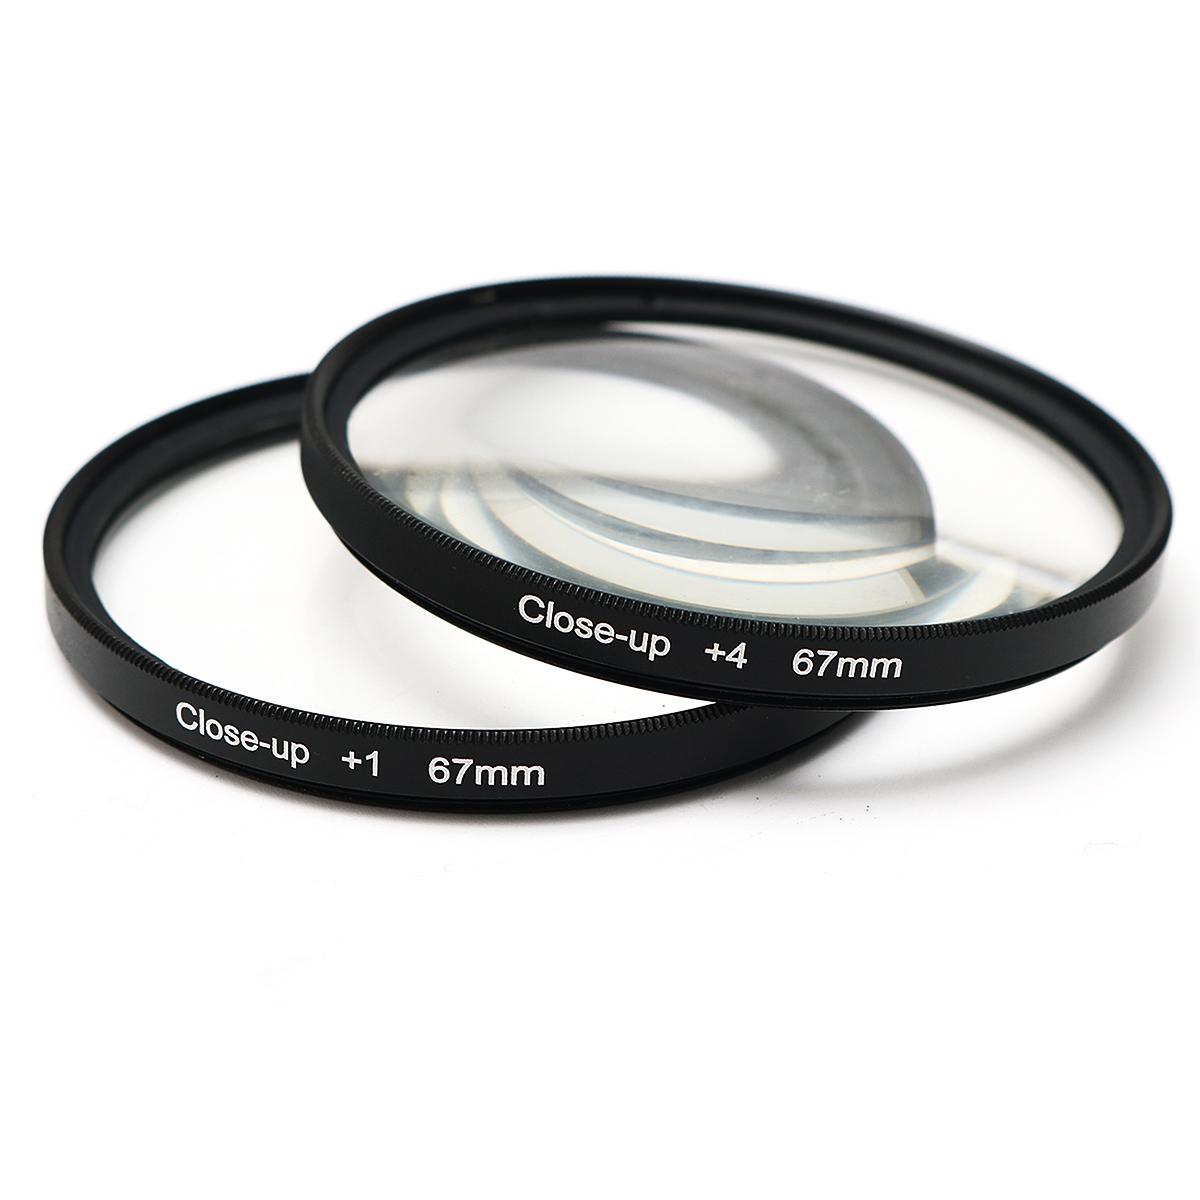 67 mm Close-Up Macro Lens Filters Kit